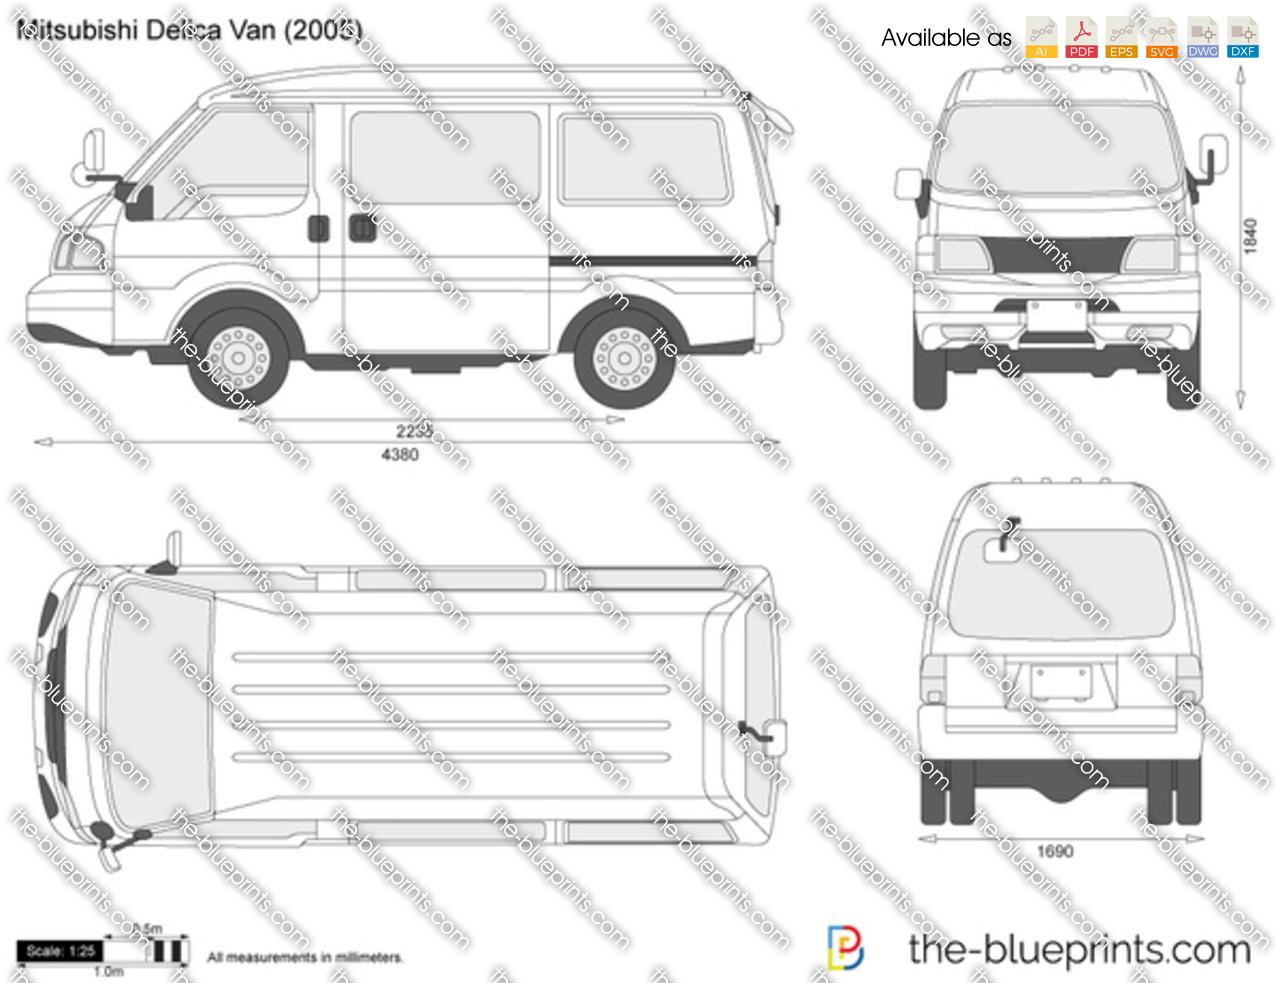 Mitsubishi Delica Van 2015